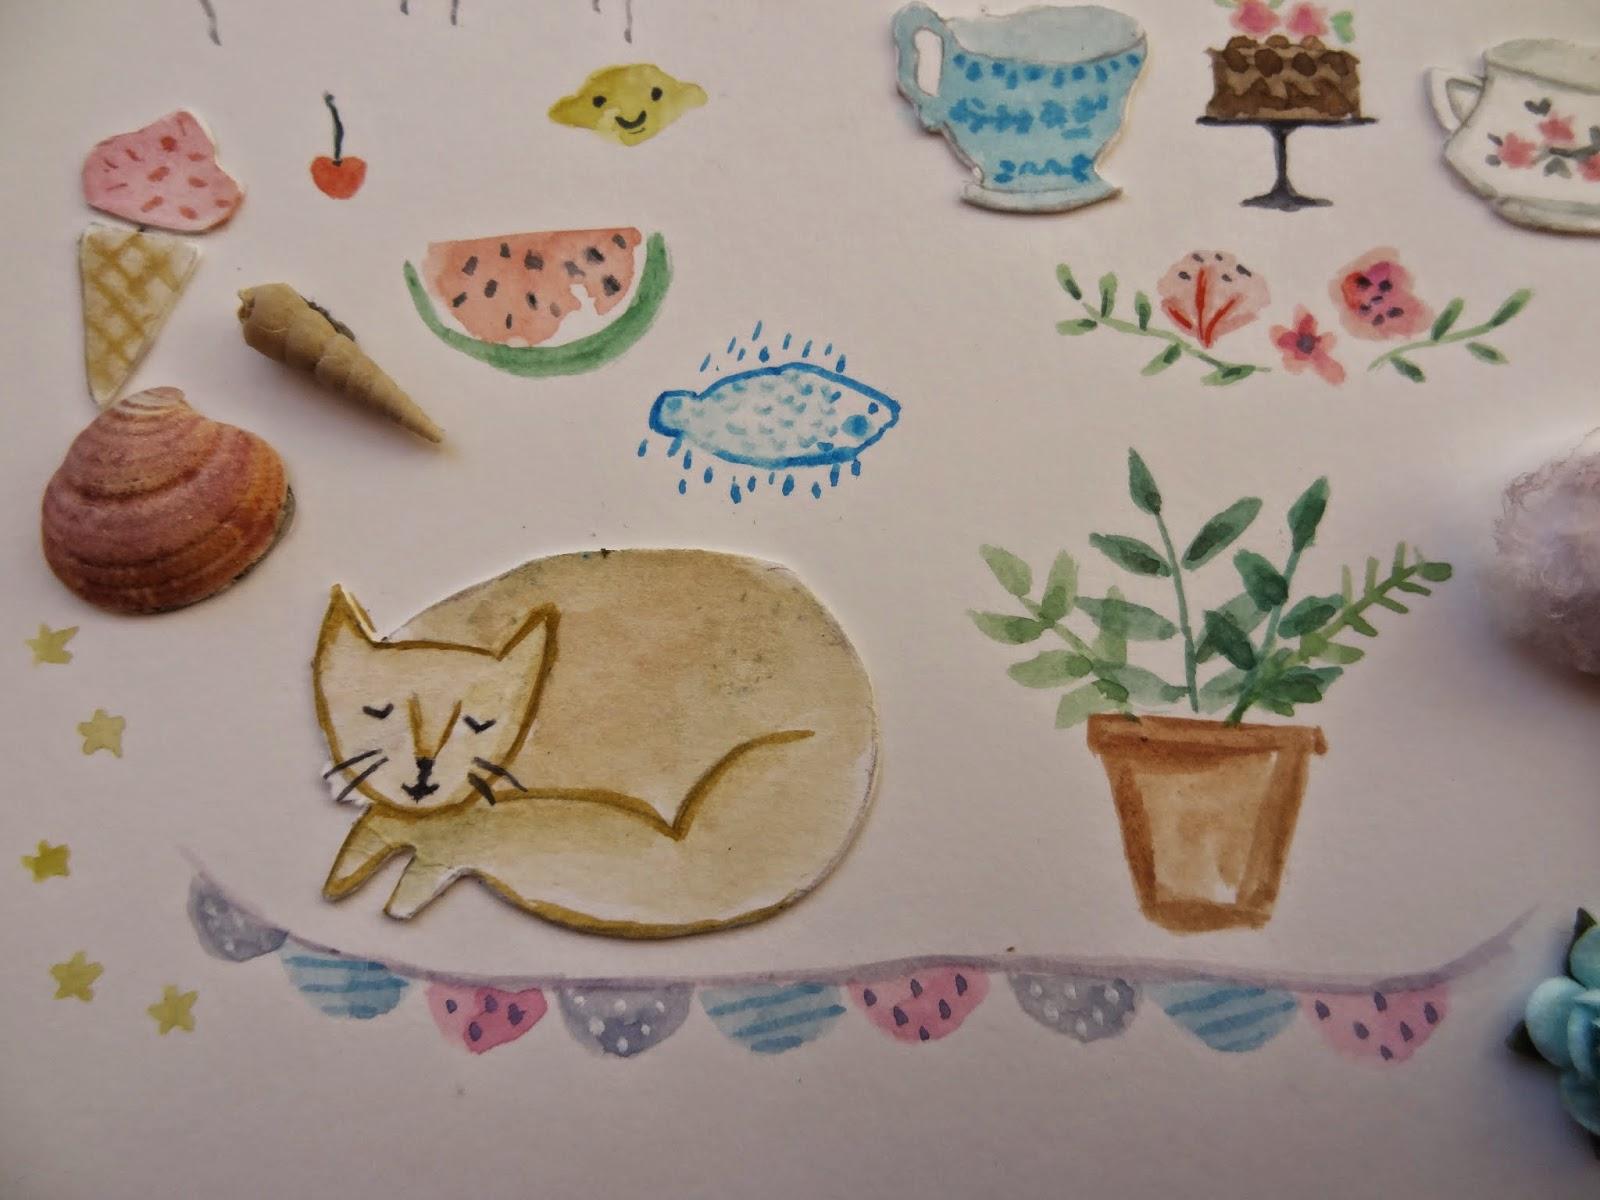 garland plants plantas lemon smile cats sweet naif craft manualidades ilustradora cherry ice cream  cup tea